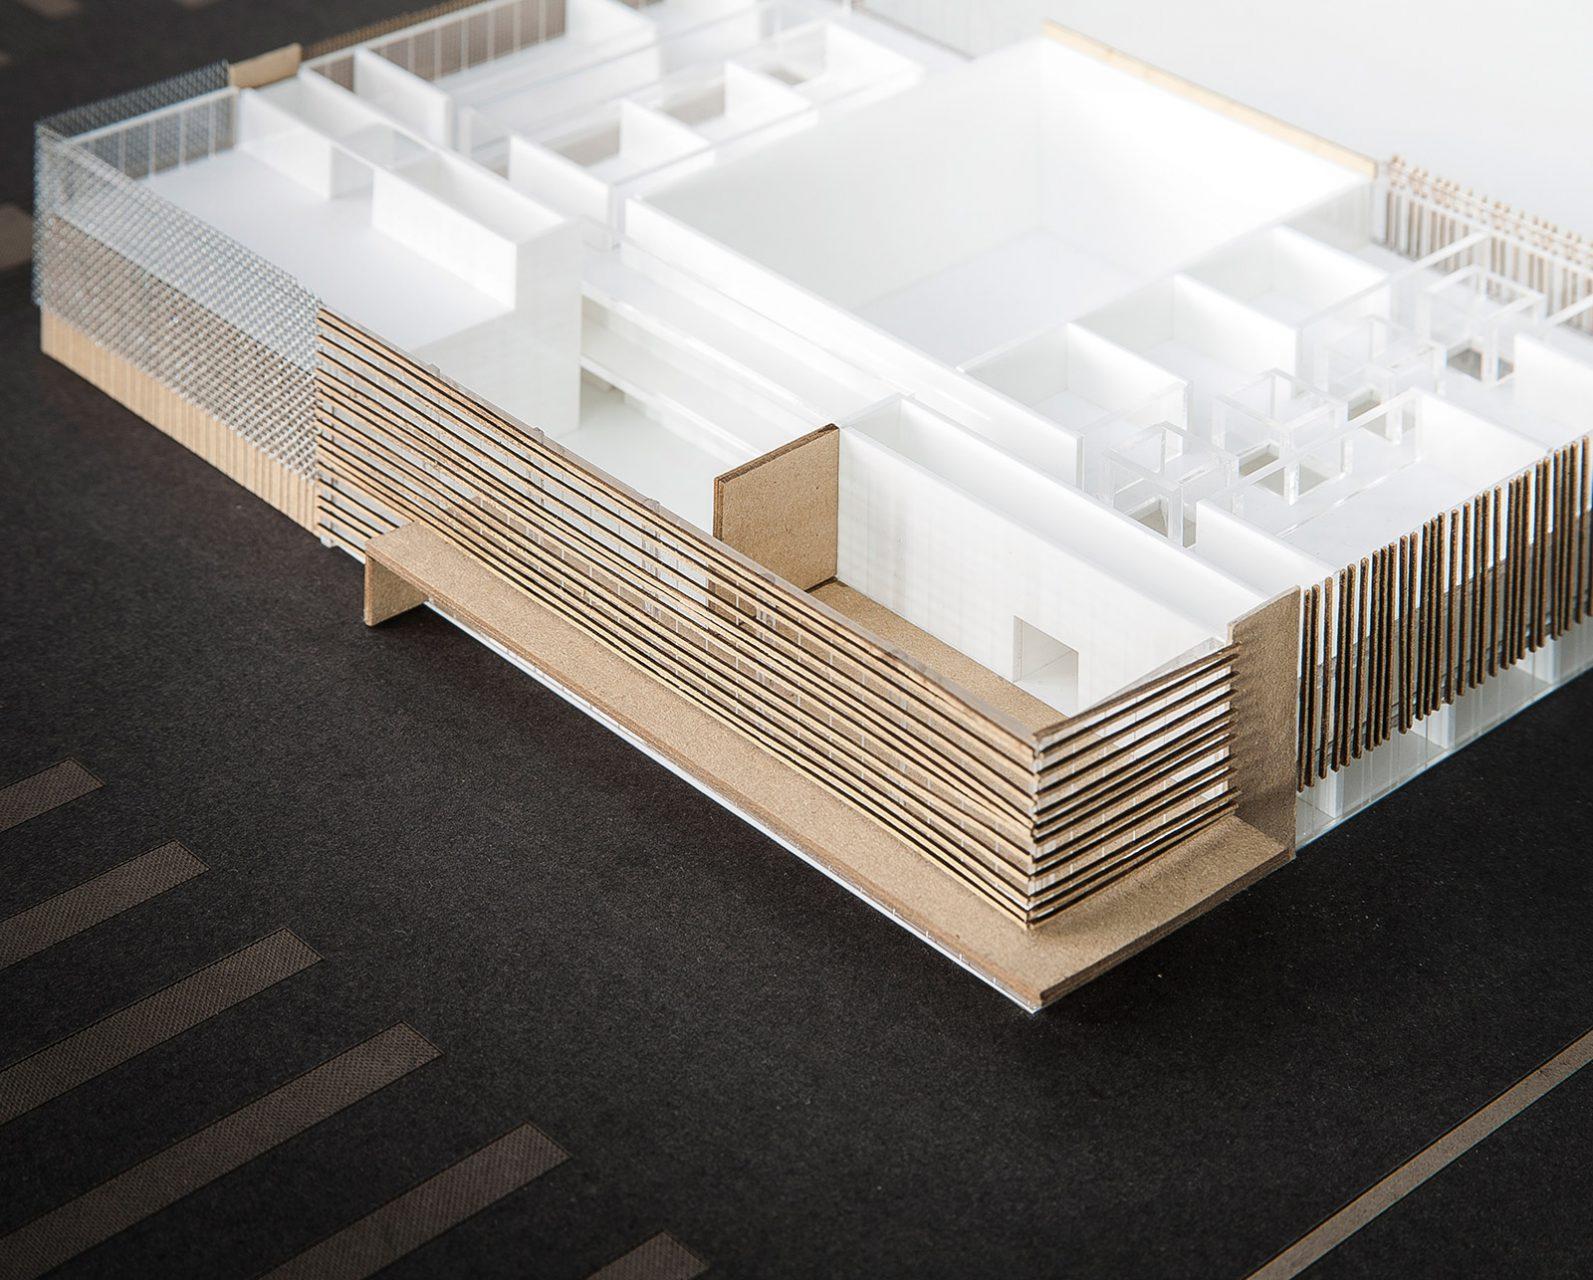 maqueta-arquitectura-architecture-model-tfg-etsav-upv-centro-de-produccion-musical-arquimaqueta-valencia-6